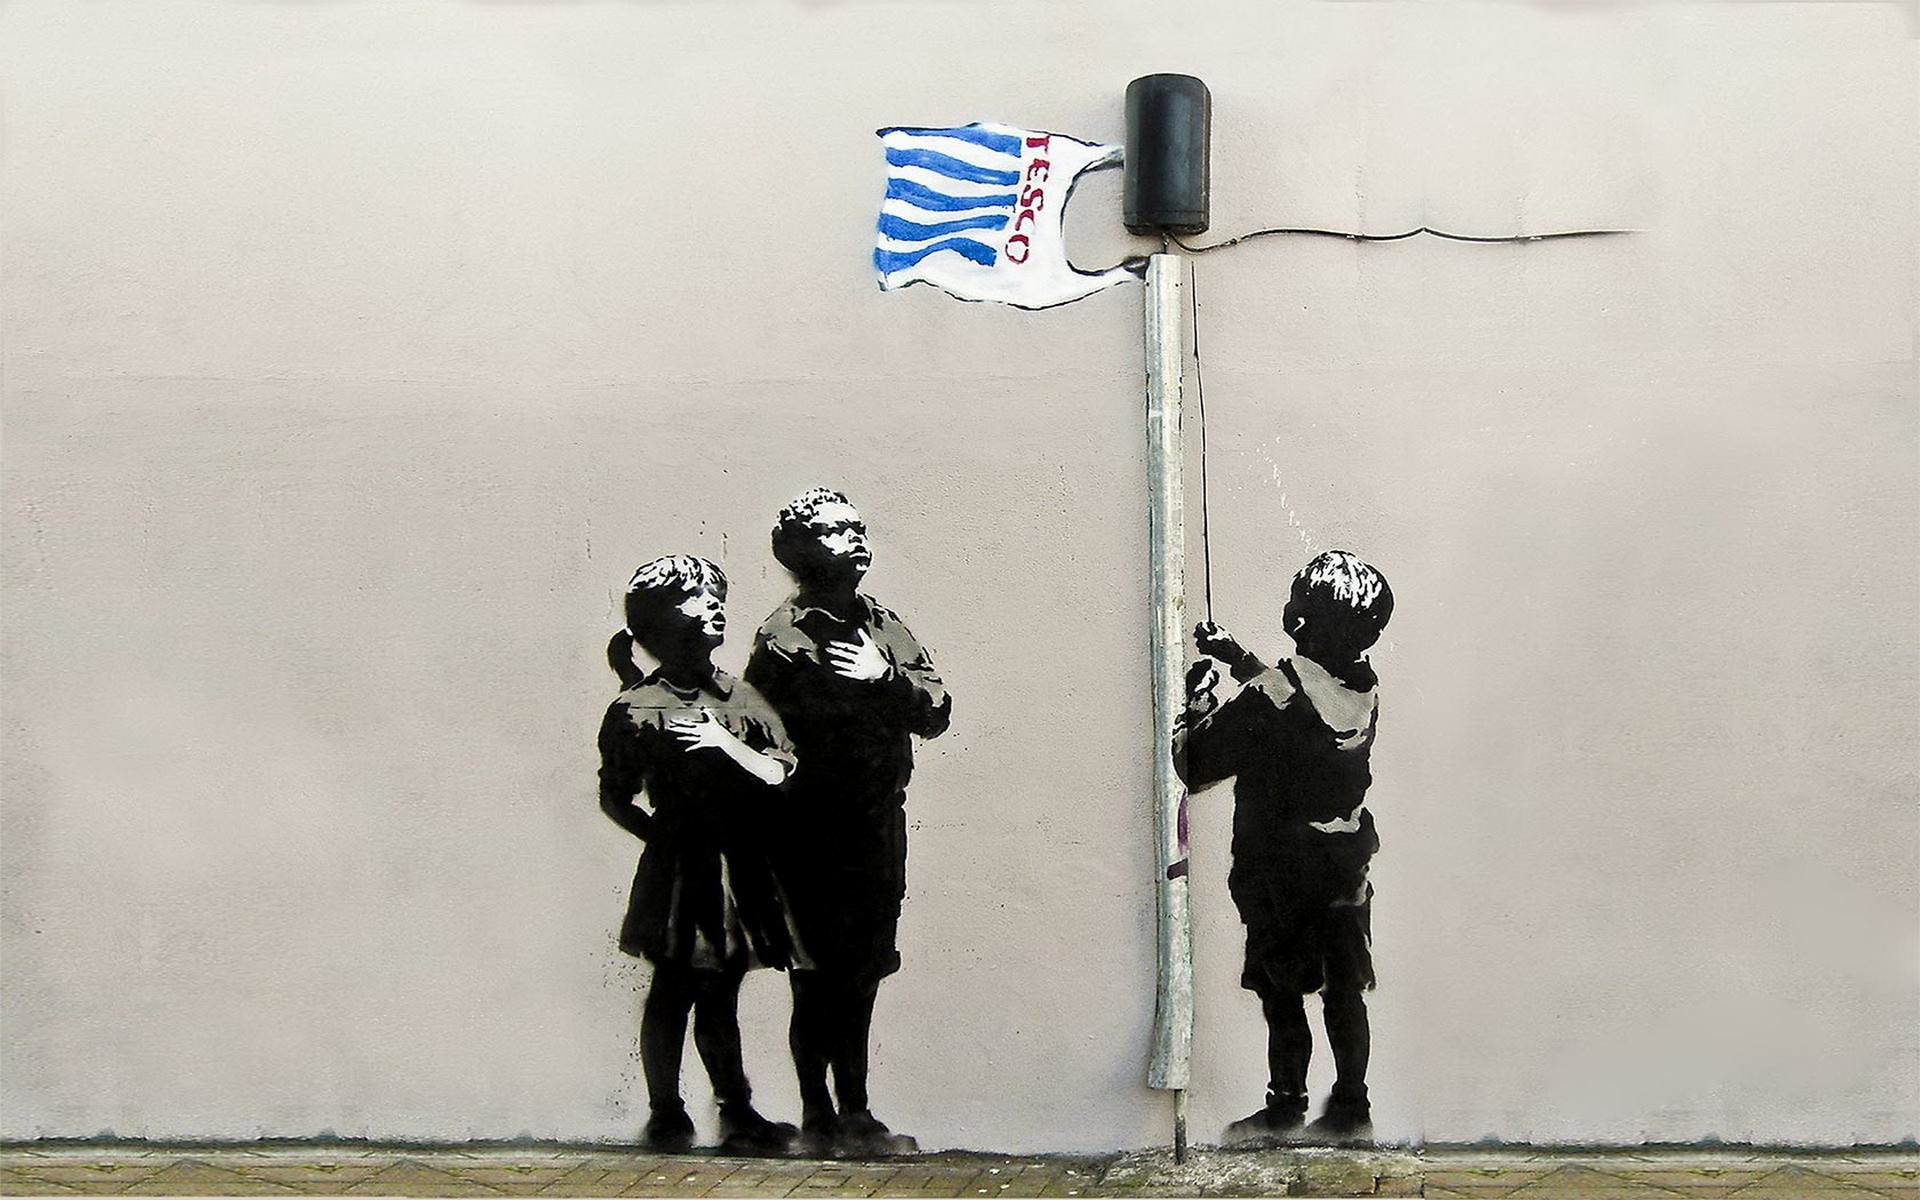 wallpaper.wiki-Banksy-Art-Wallpaper-for-Desktop-PIC-